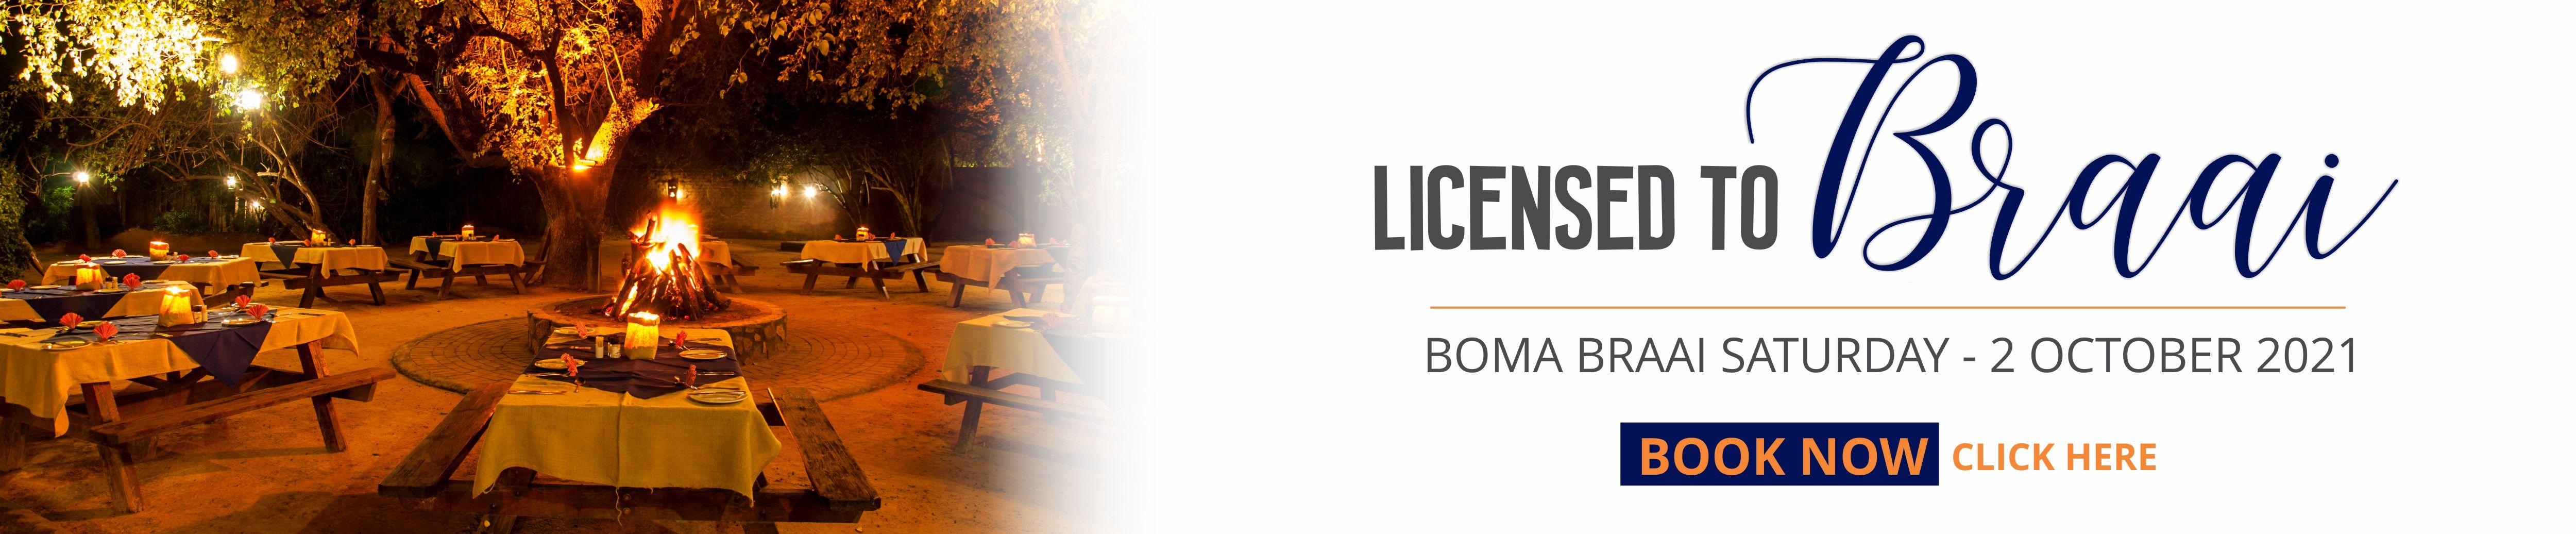 October Boma Braai 2021